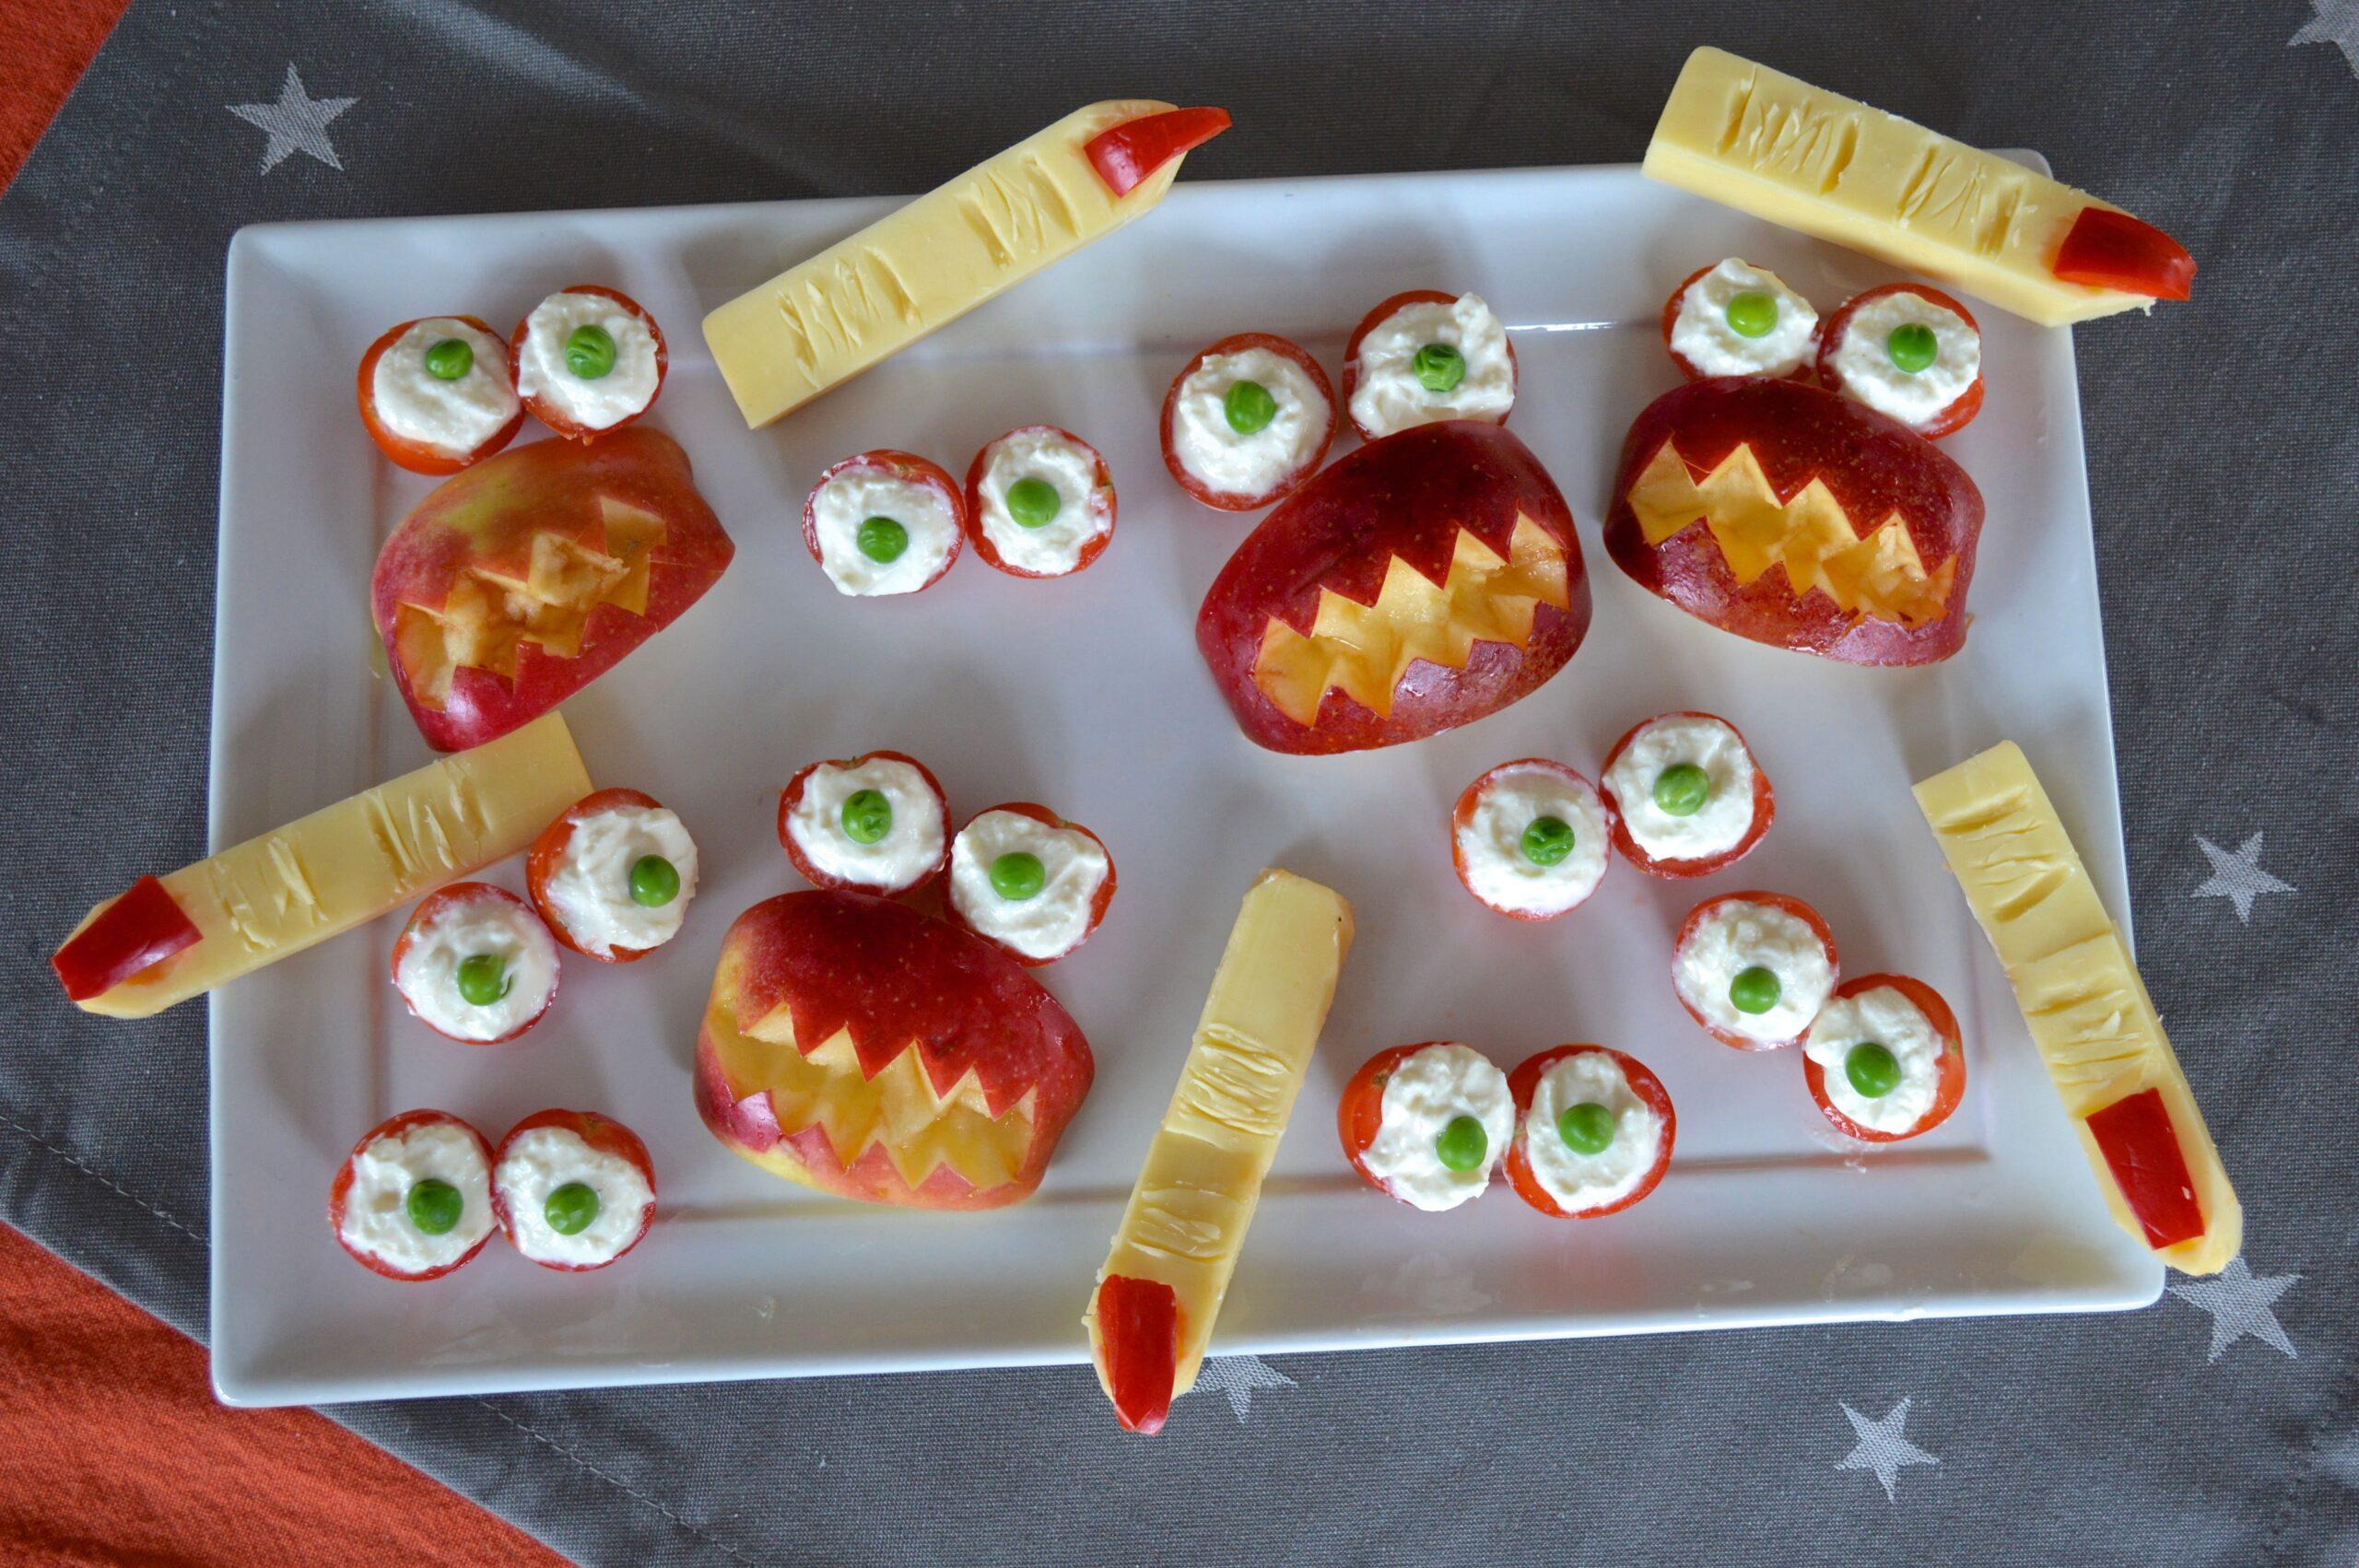 Edible Eyeballs Halloween Party Food for Kids